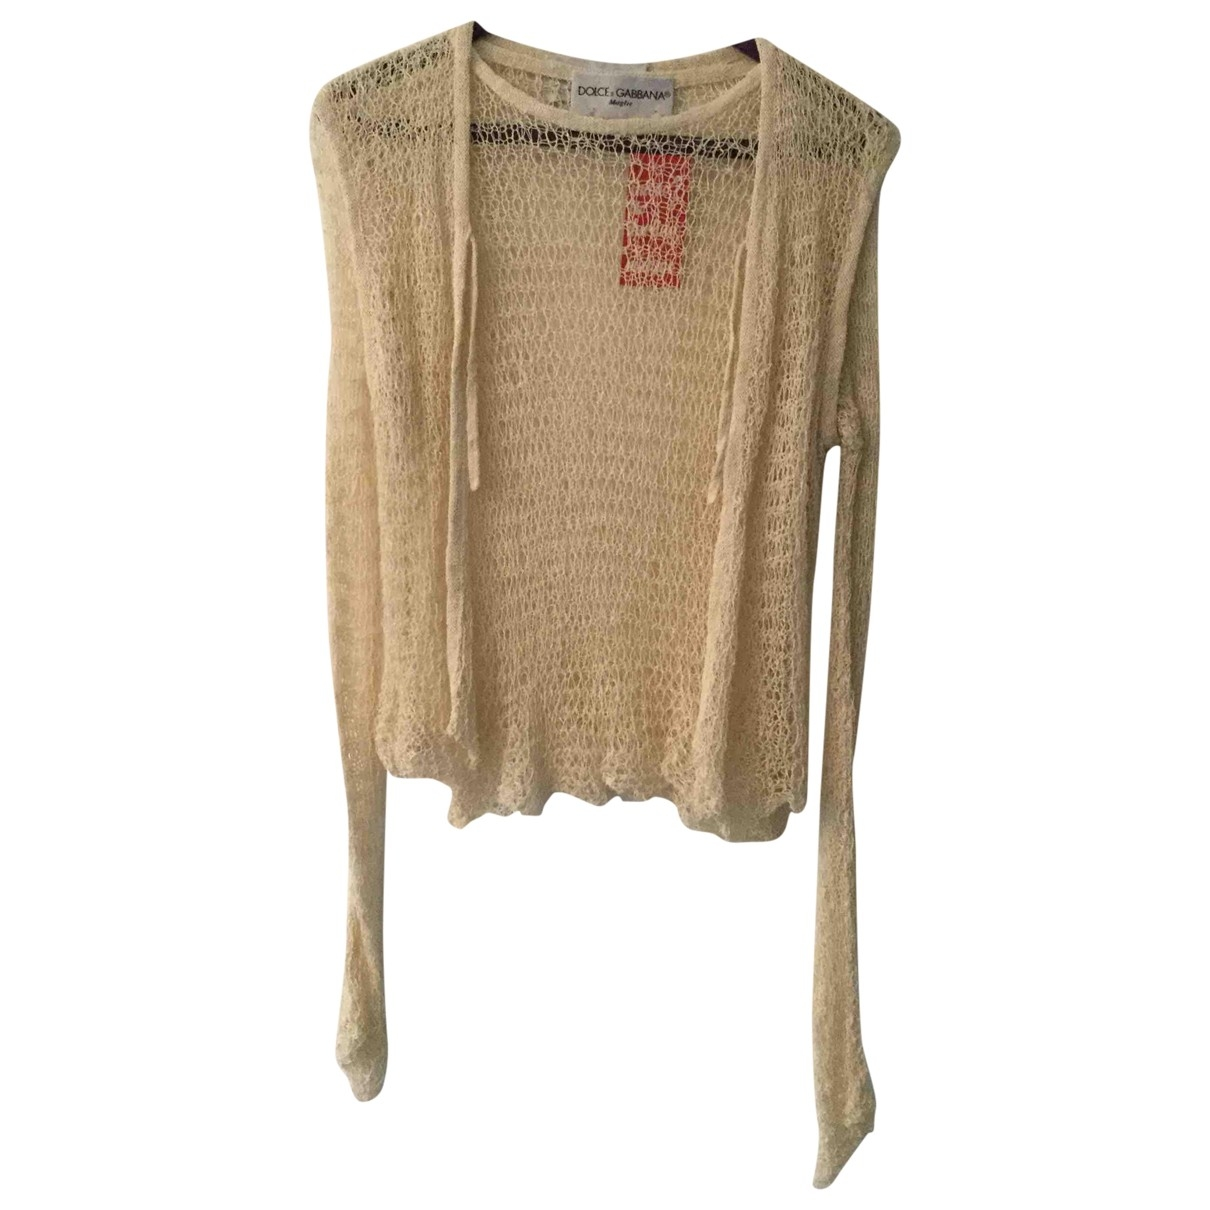 Camiseta de Lino Dolce & Gabbana